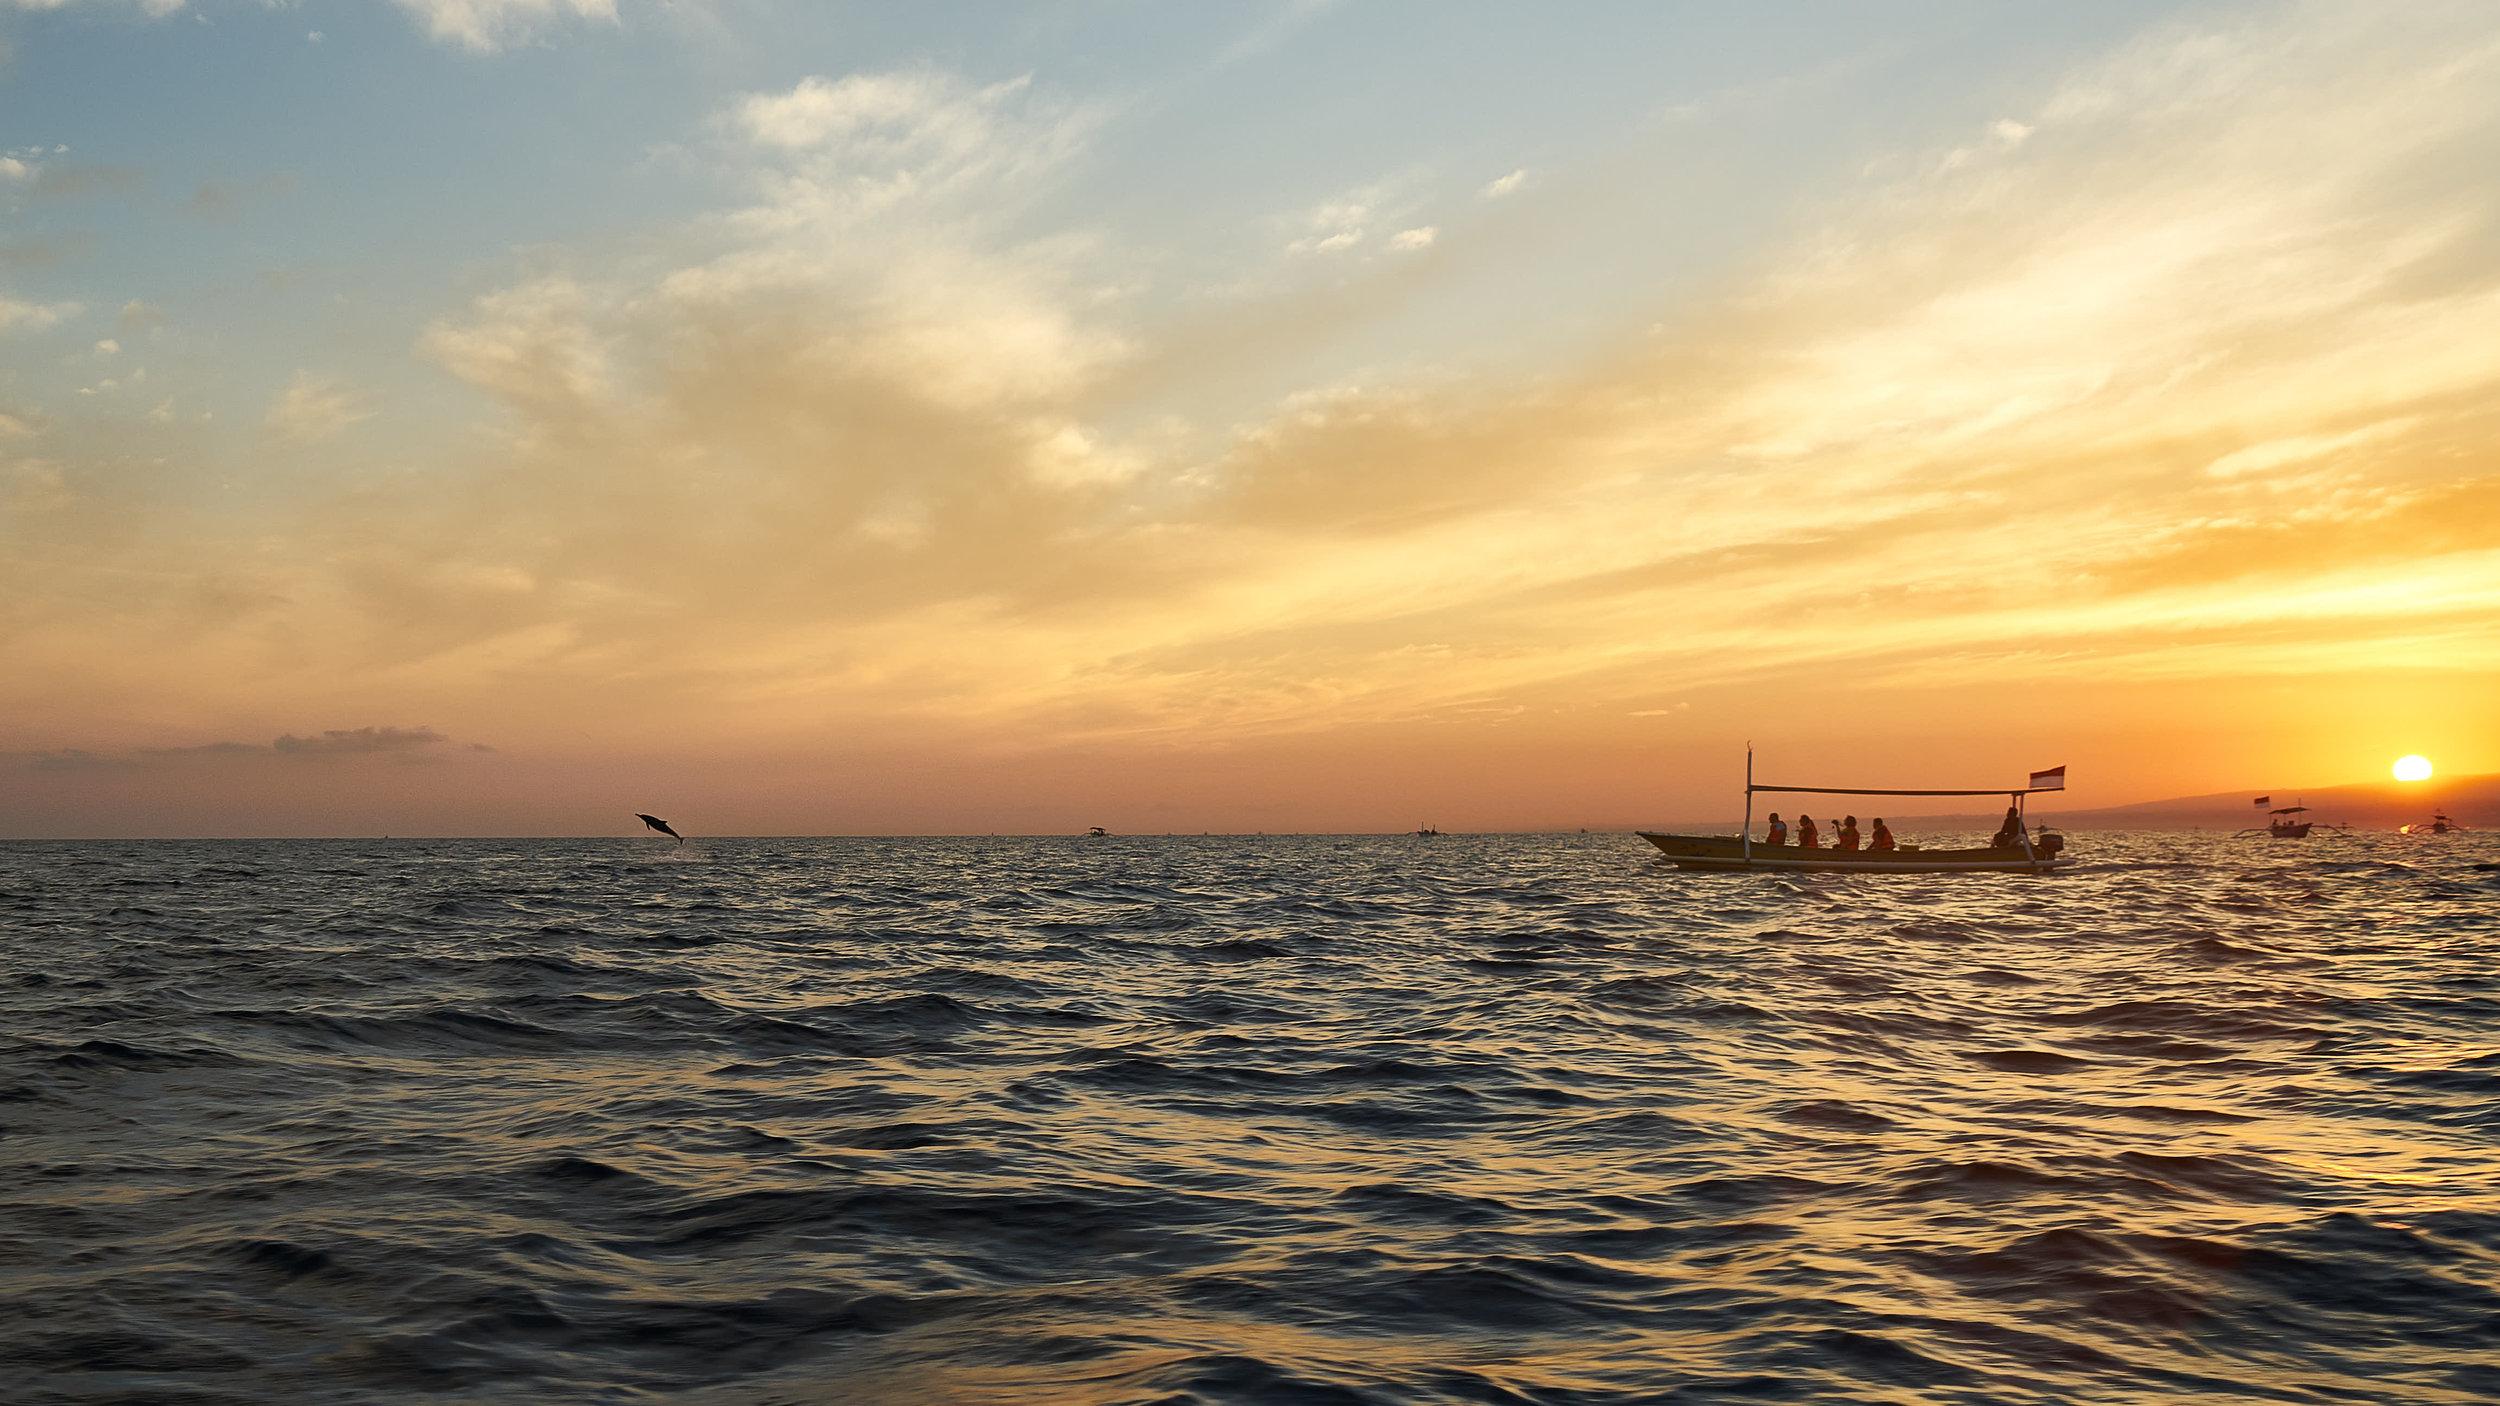 Touristenmagnet: Delfin-Spotting